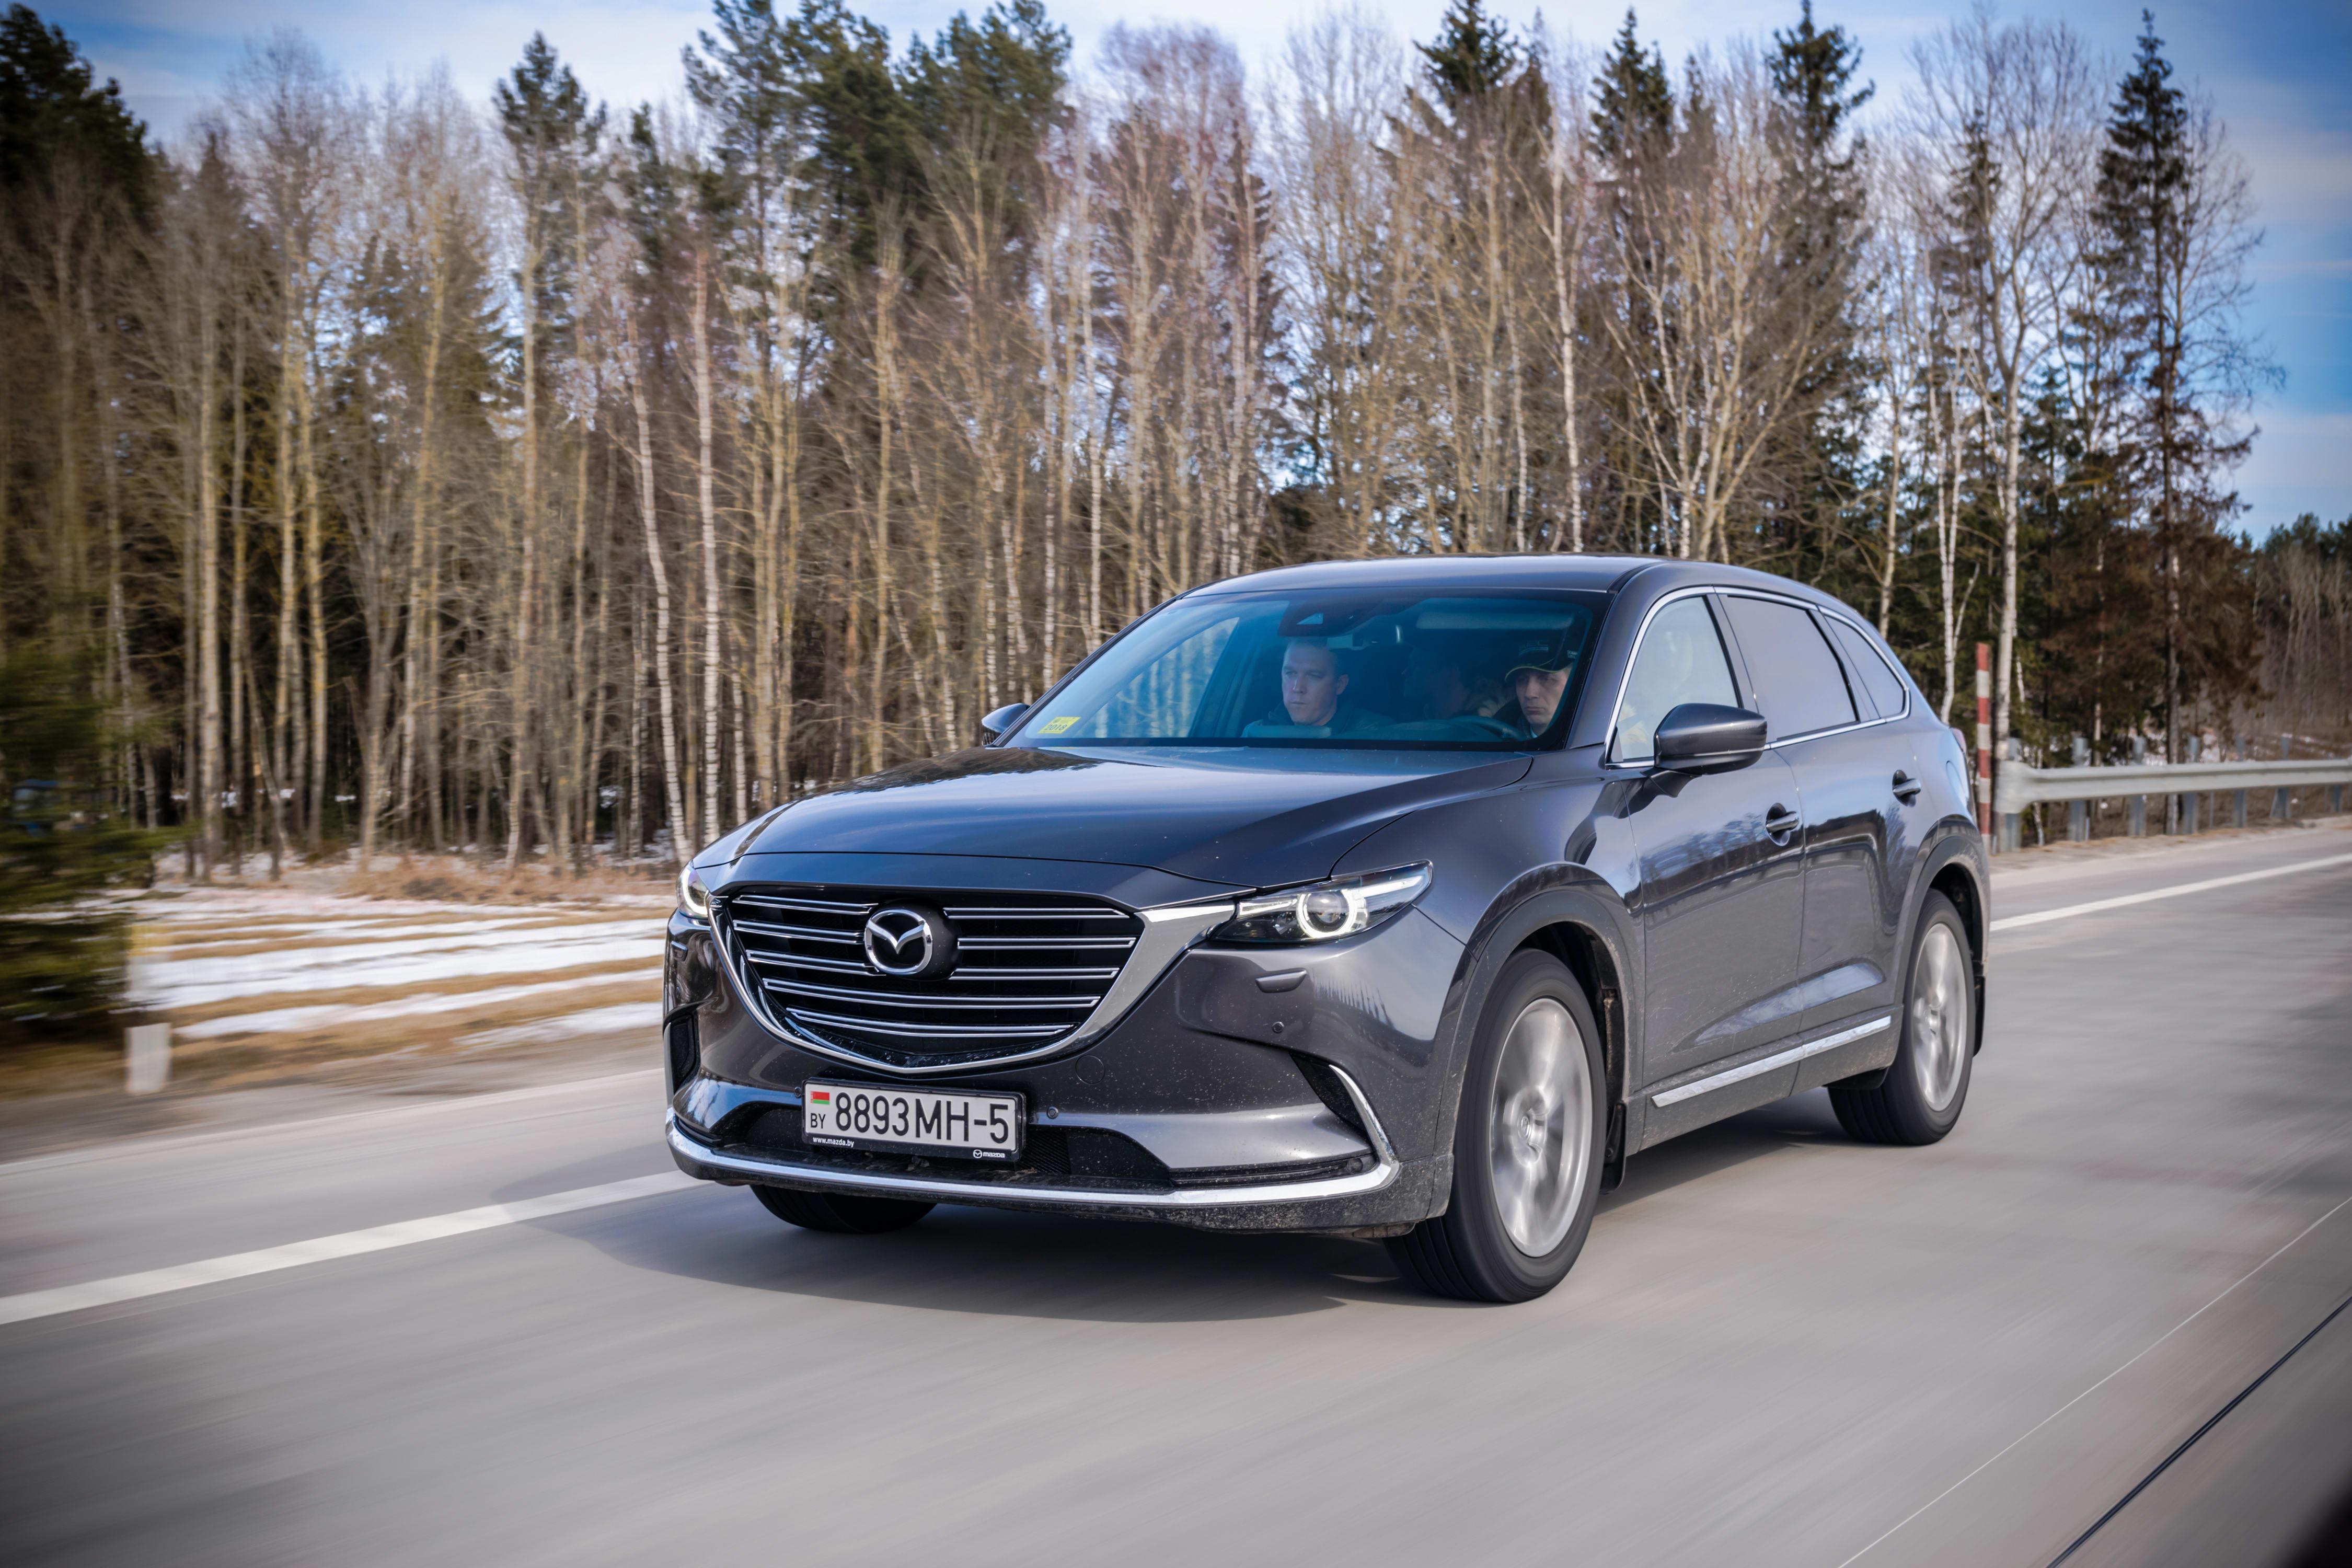 Potential Tread Detachment Spurs Recall on Mazda CX-9s